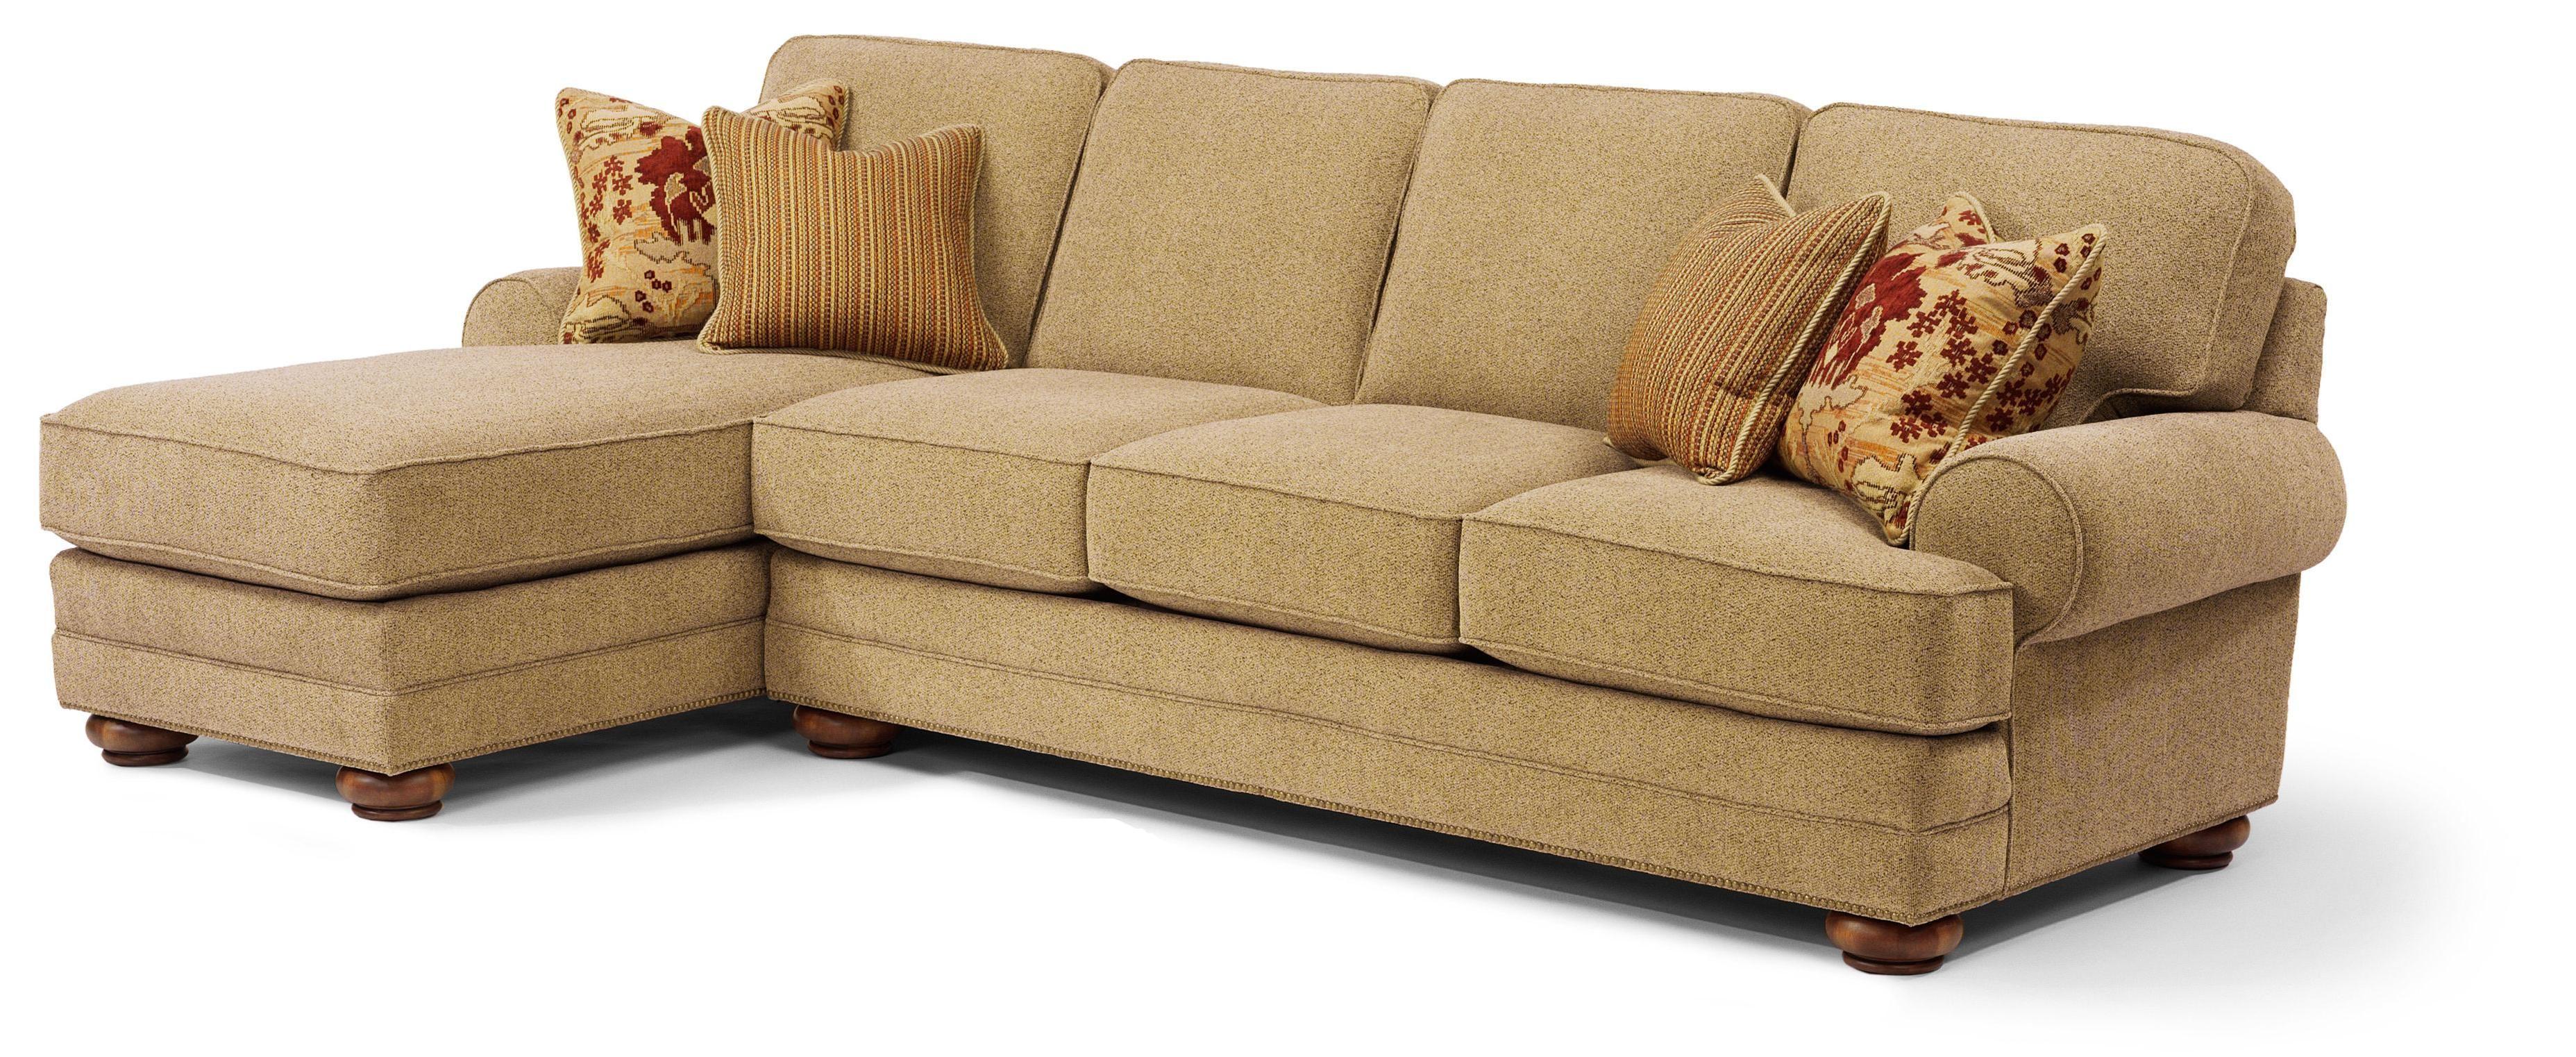 Best That S My Style Custom 2 Piece Sectional Sofa By Flexsteel 400 x 300